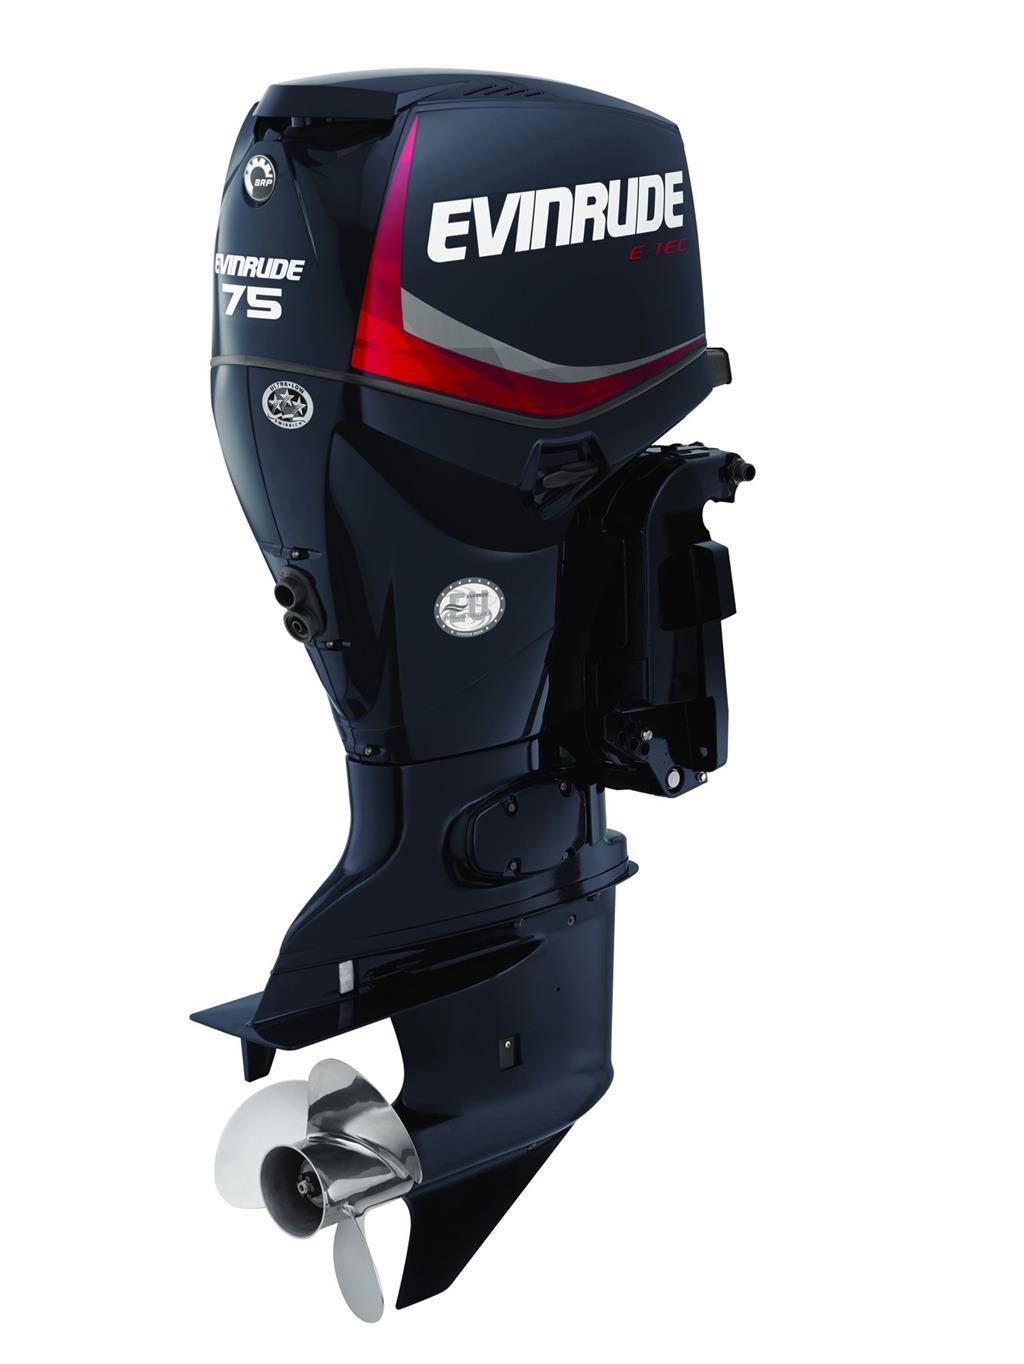 Evinrude E-Tec 75hp Outboard Engine - EX DEMO - Image 0